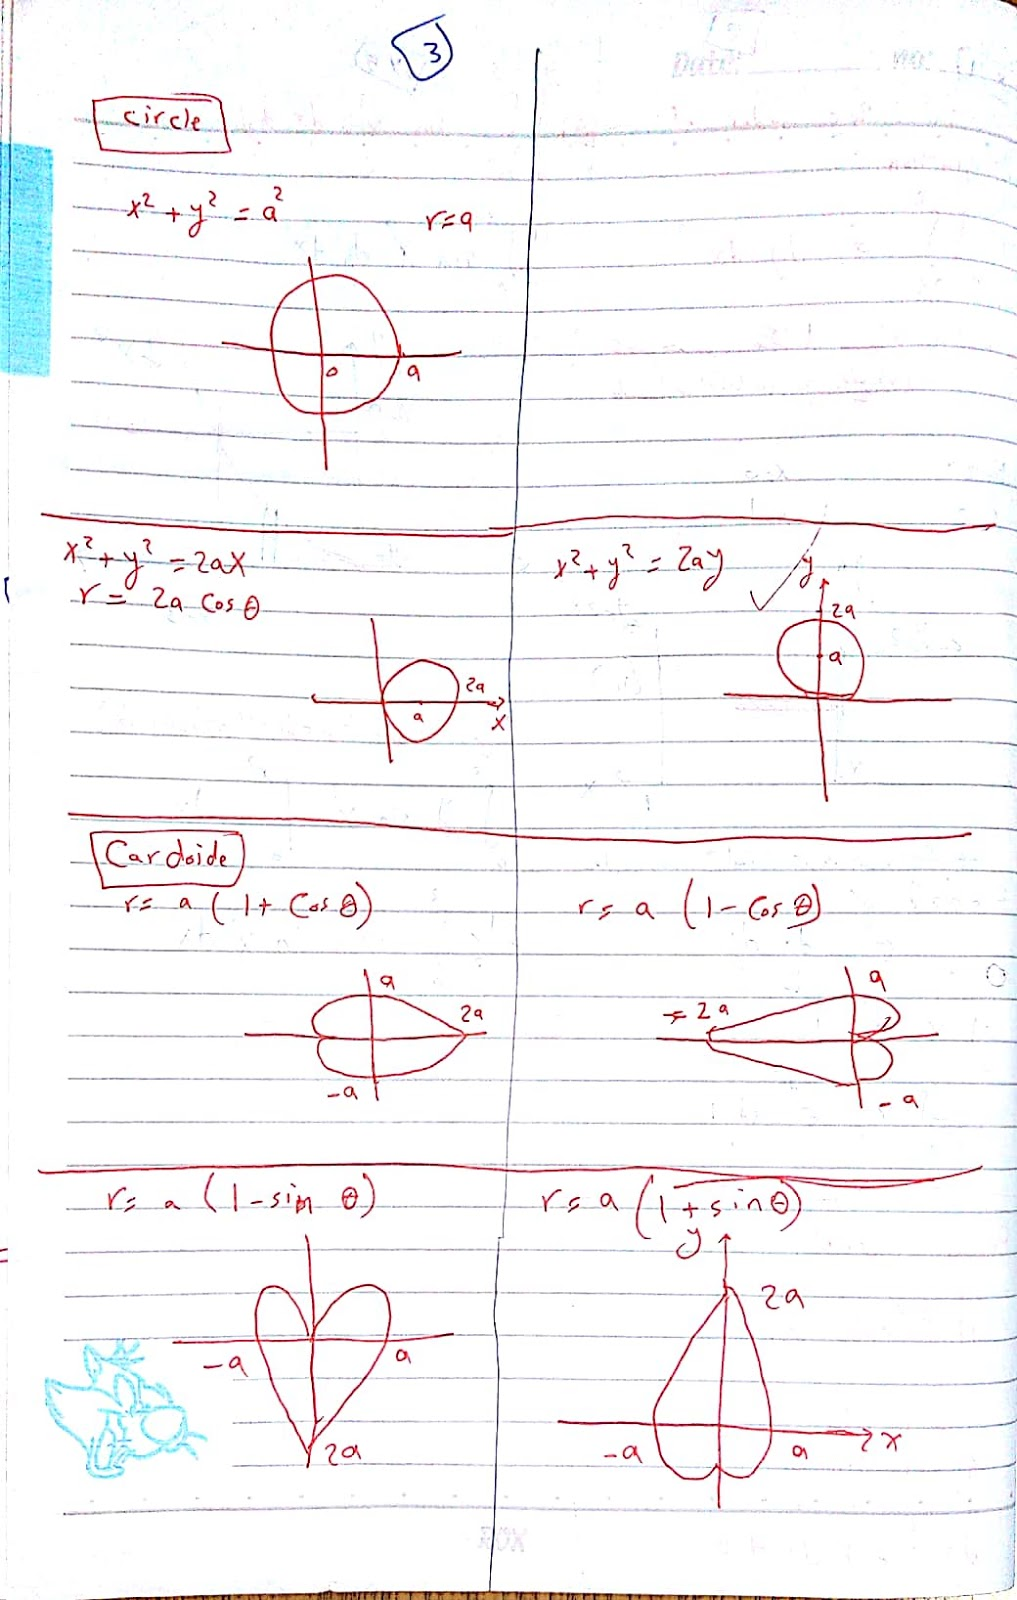 cardoid equation